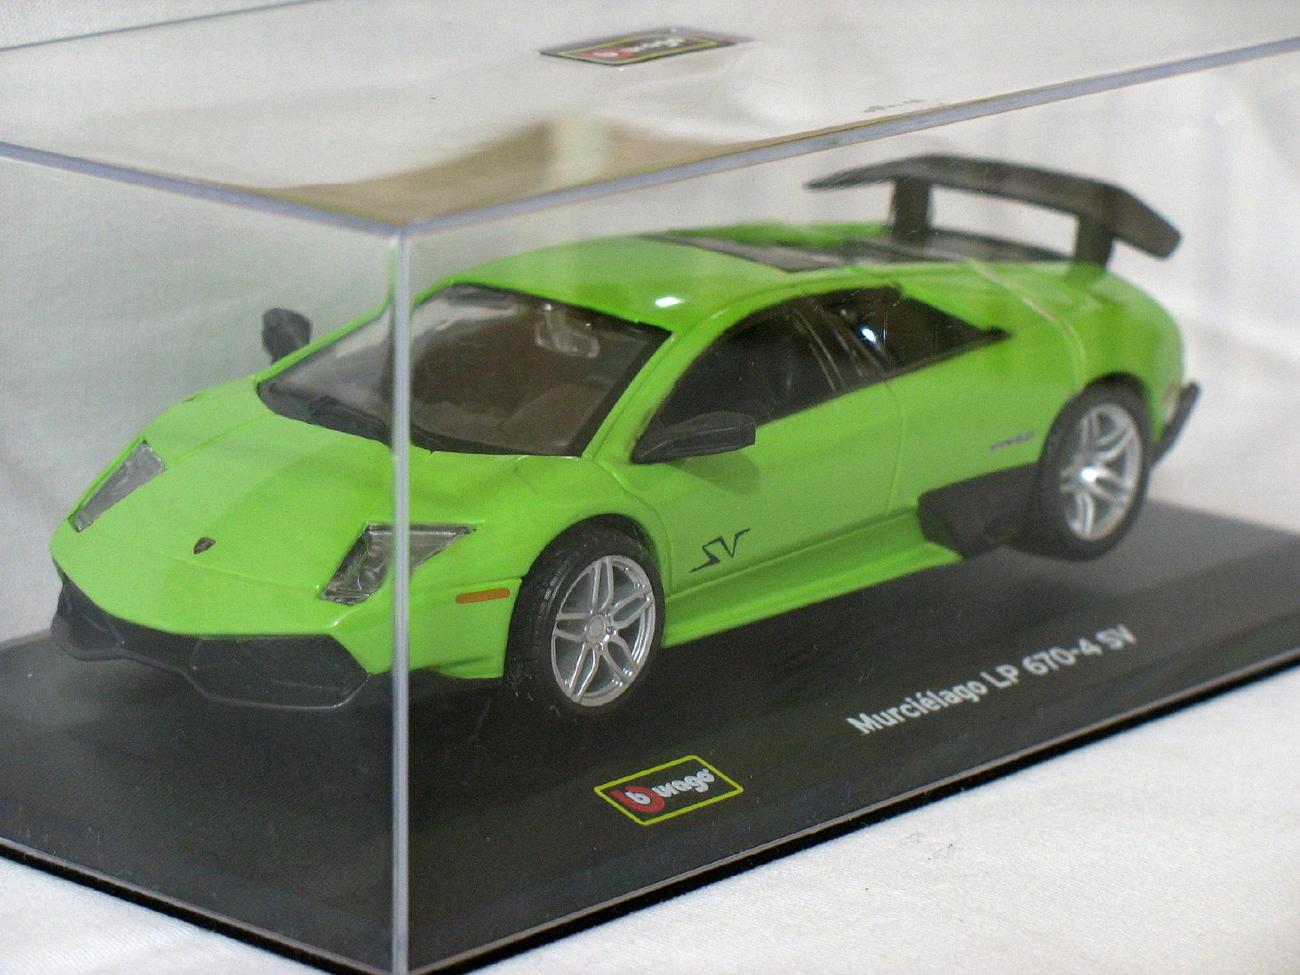 Lamborghini murcielago lp 670 4 sv green.2 1 1 1 1